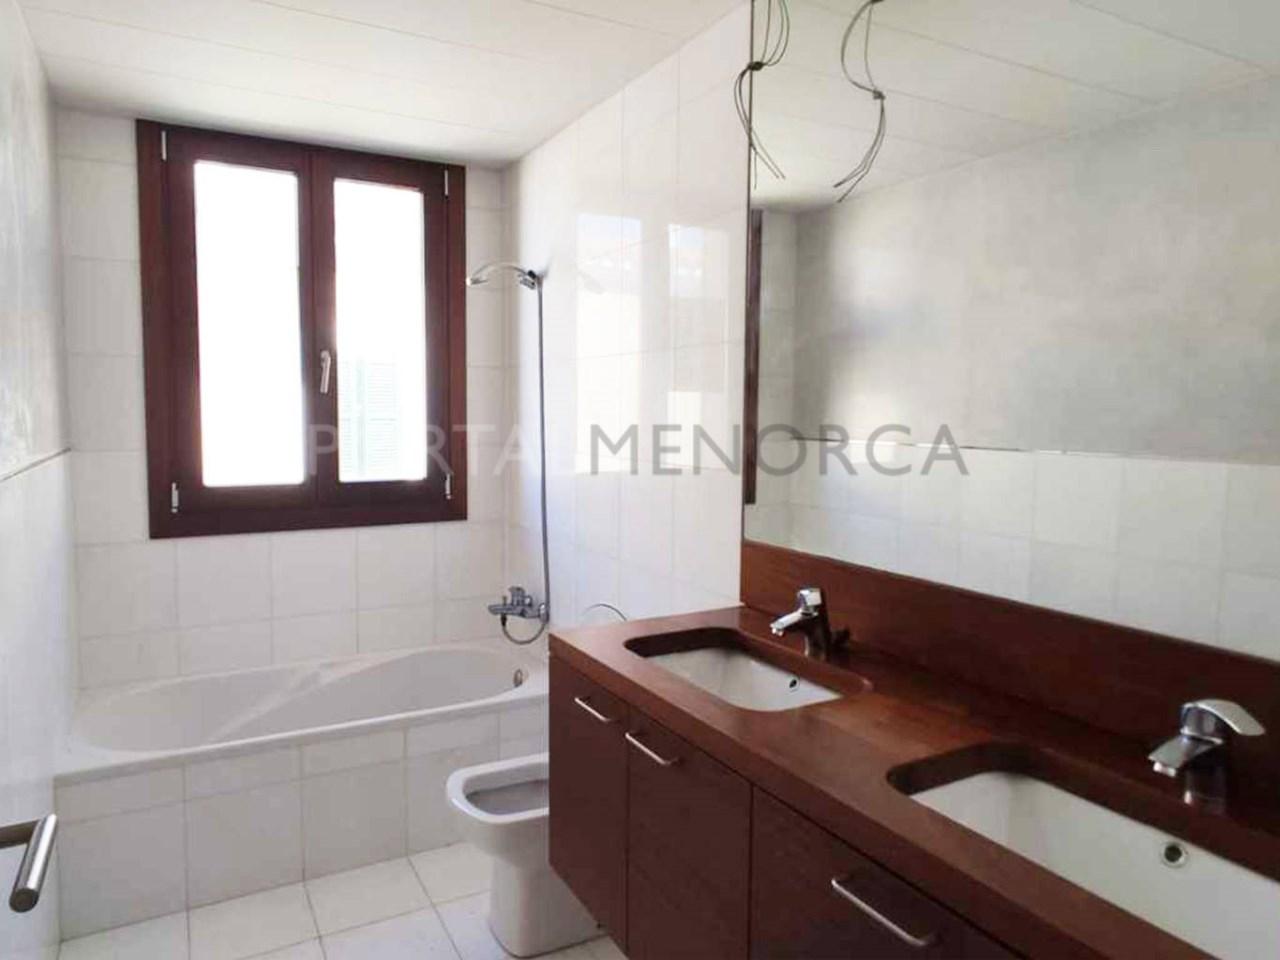 Apartment in the center of Ciutadella_bathroom